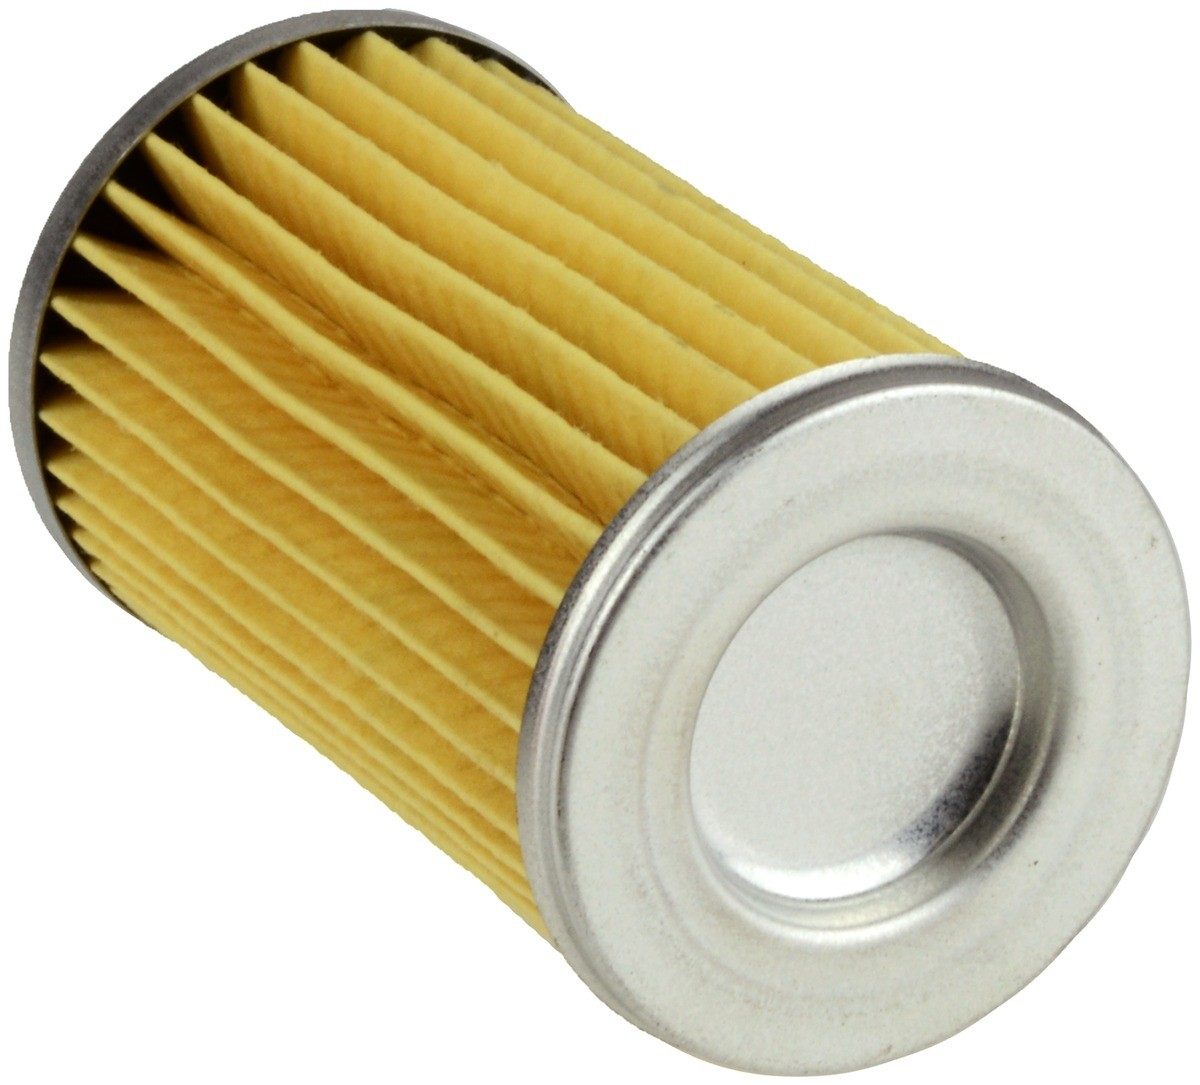 hight resolution of 1967 gmc p25 p2500 van fuel filter ff g6